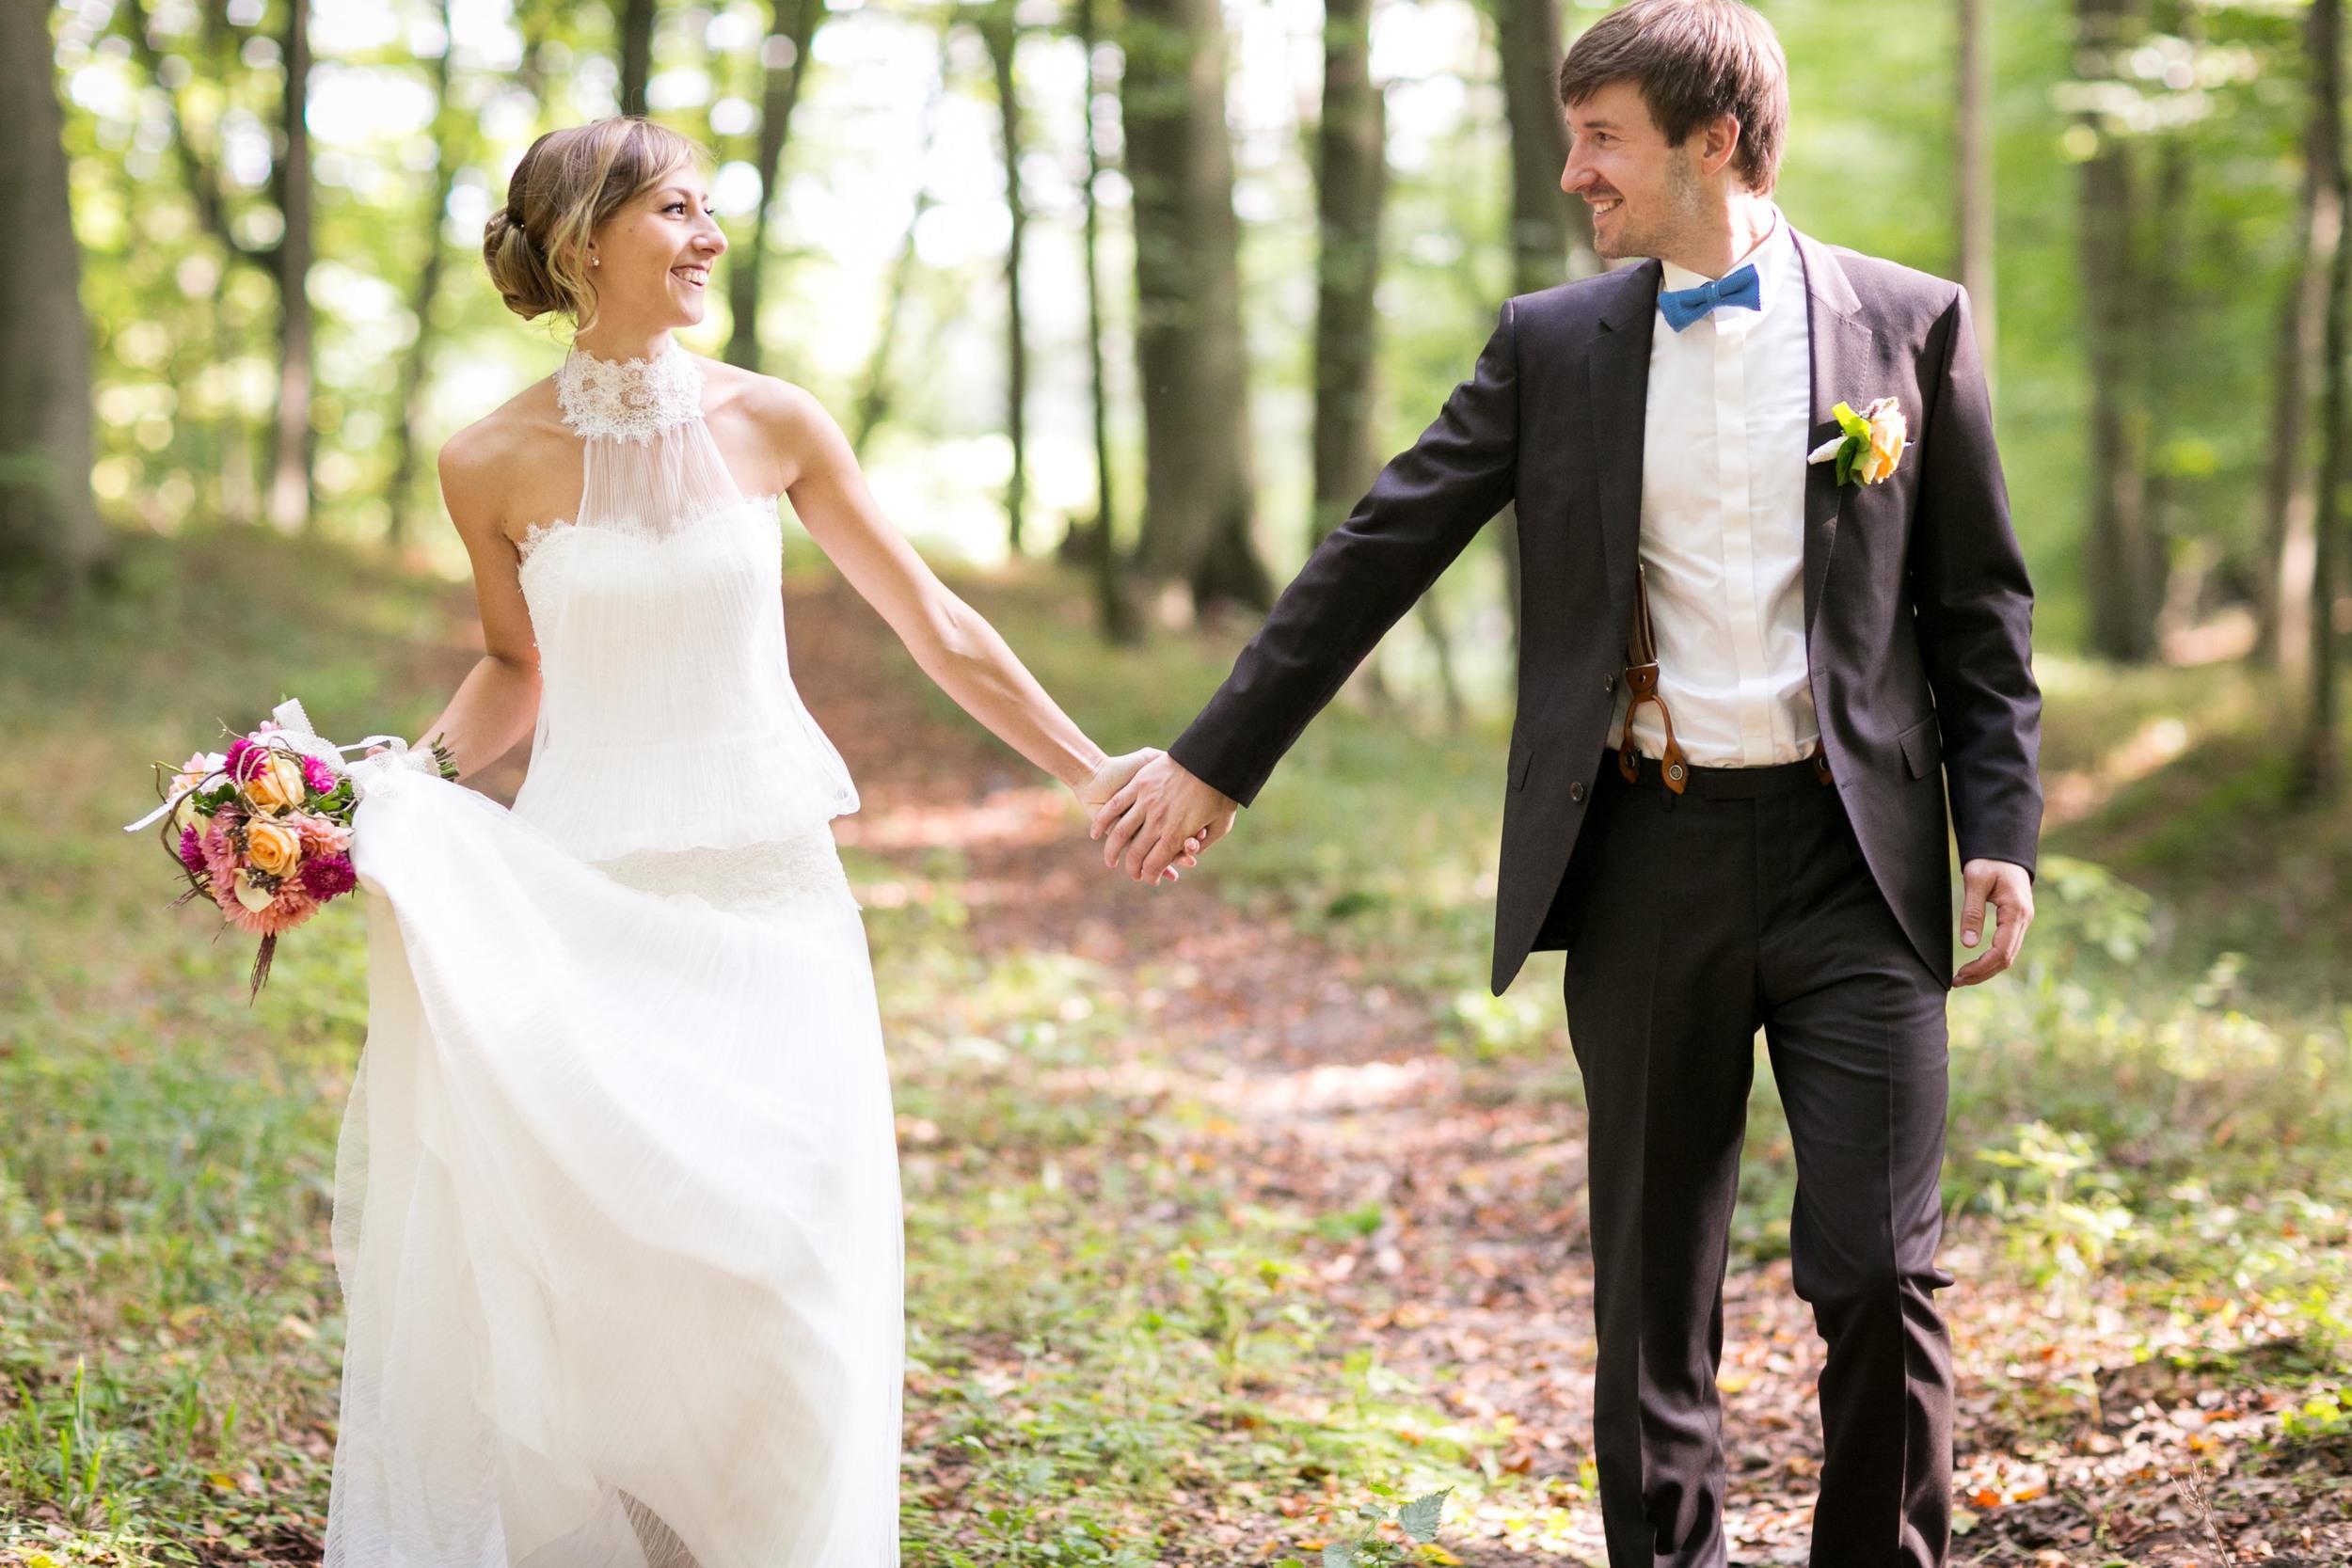 Fran Burrows Hochzeitsfotografie_Kulturgut Wrechen Hochzeit-40.jpg